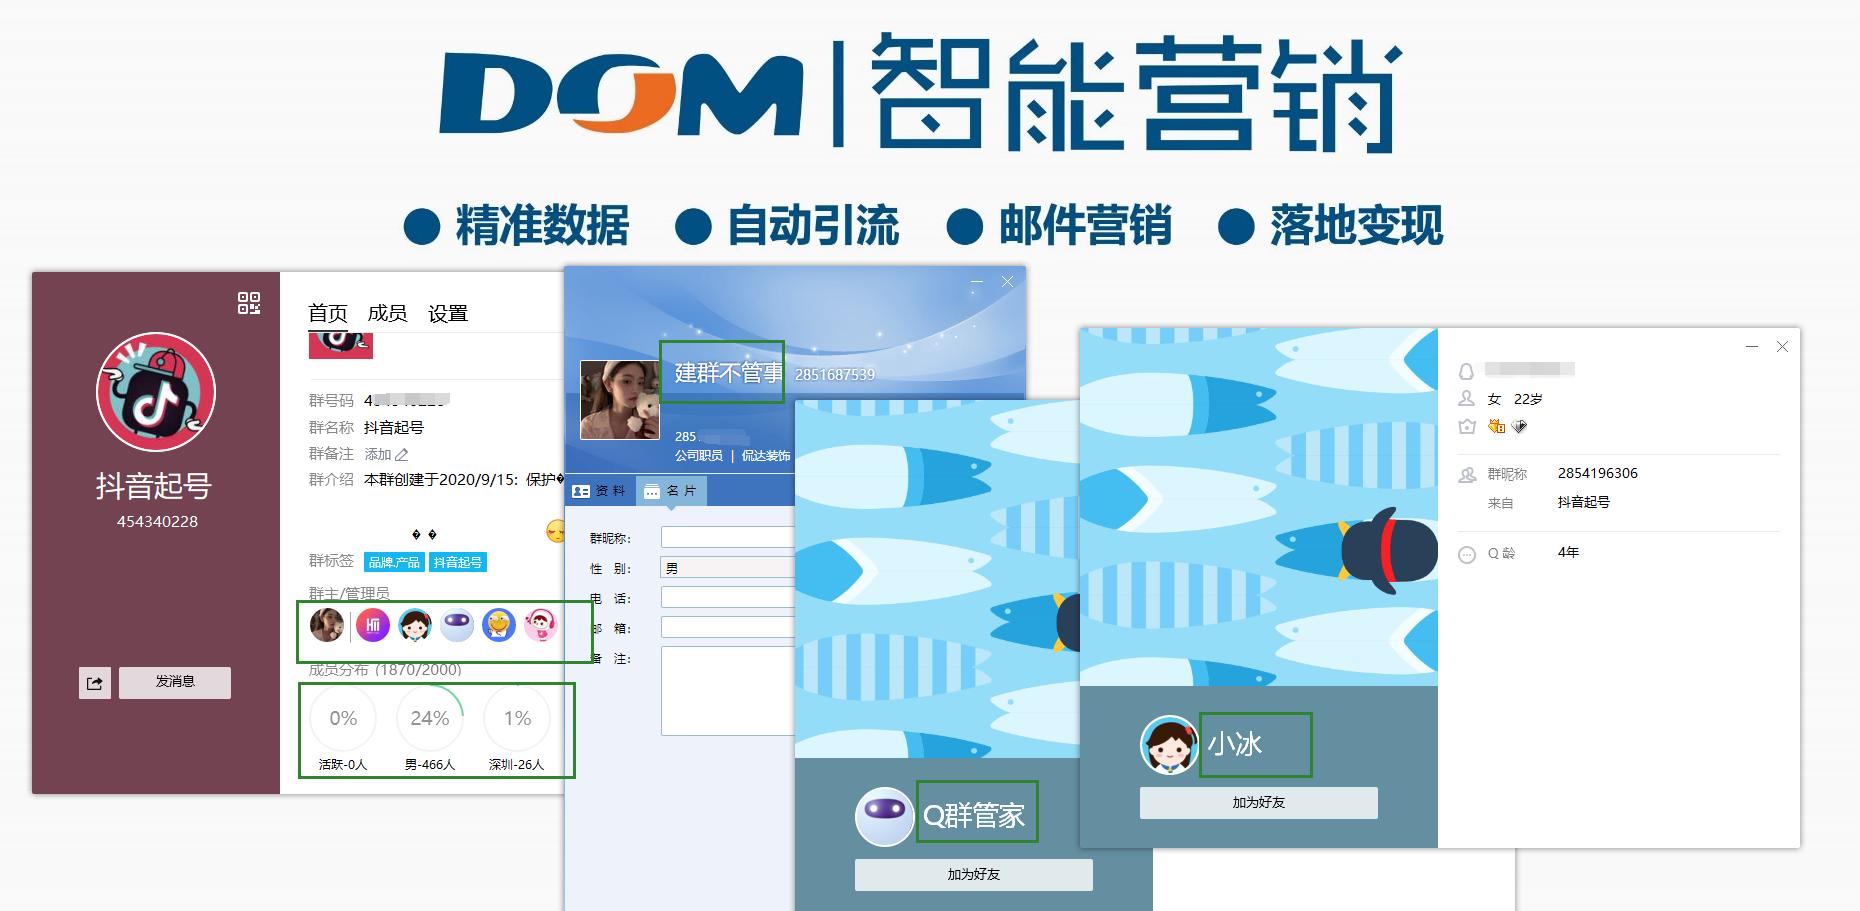 DOM智能营销 - 精准用户群,应该怎么加?